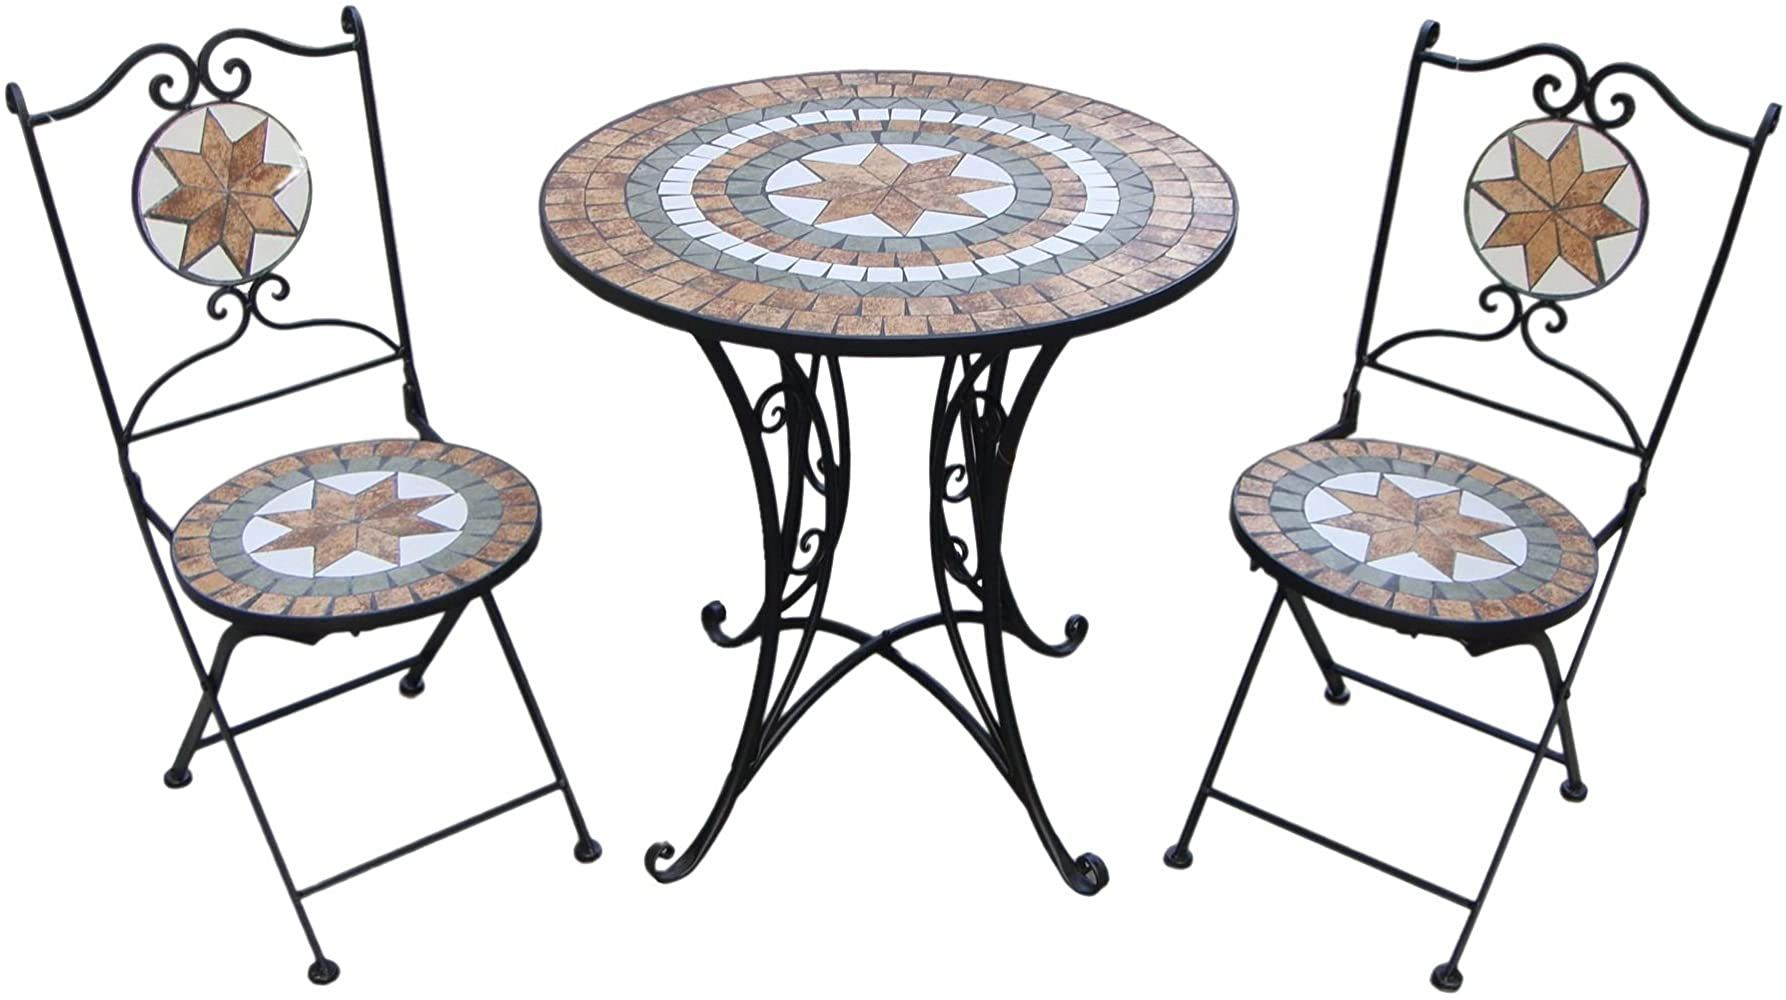 Giardino Mosaikset Gartenset 1 Tisch 2 Stuhle Ay2656 Gartenset